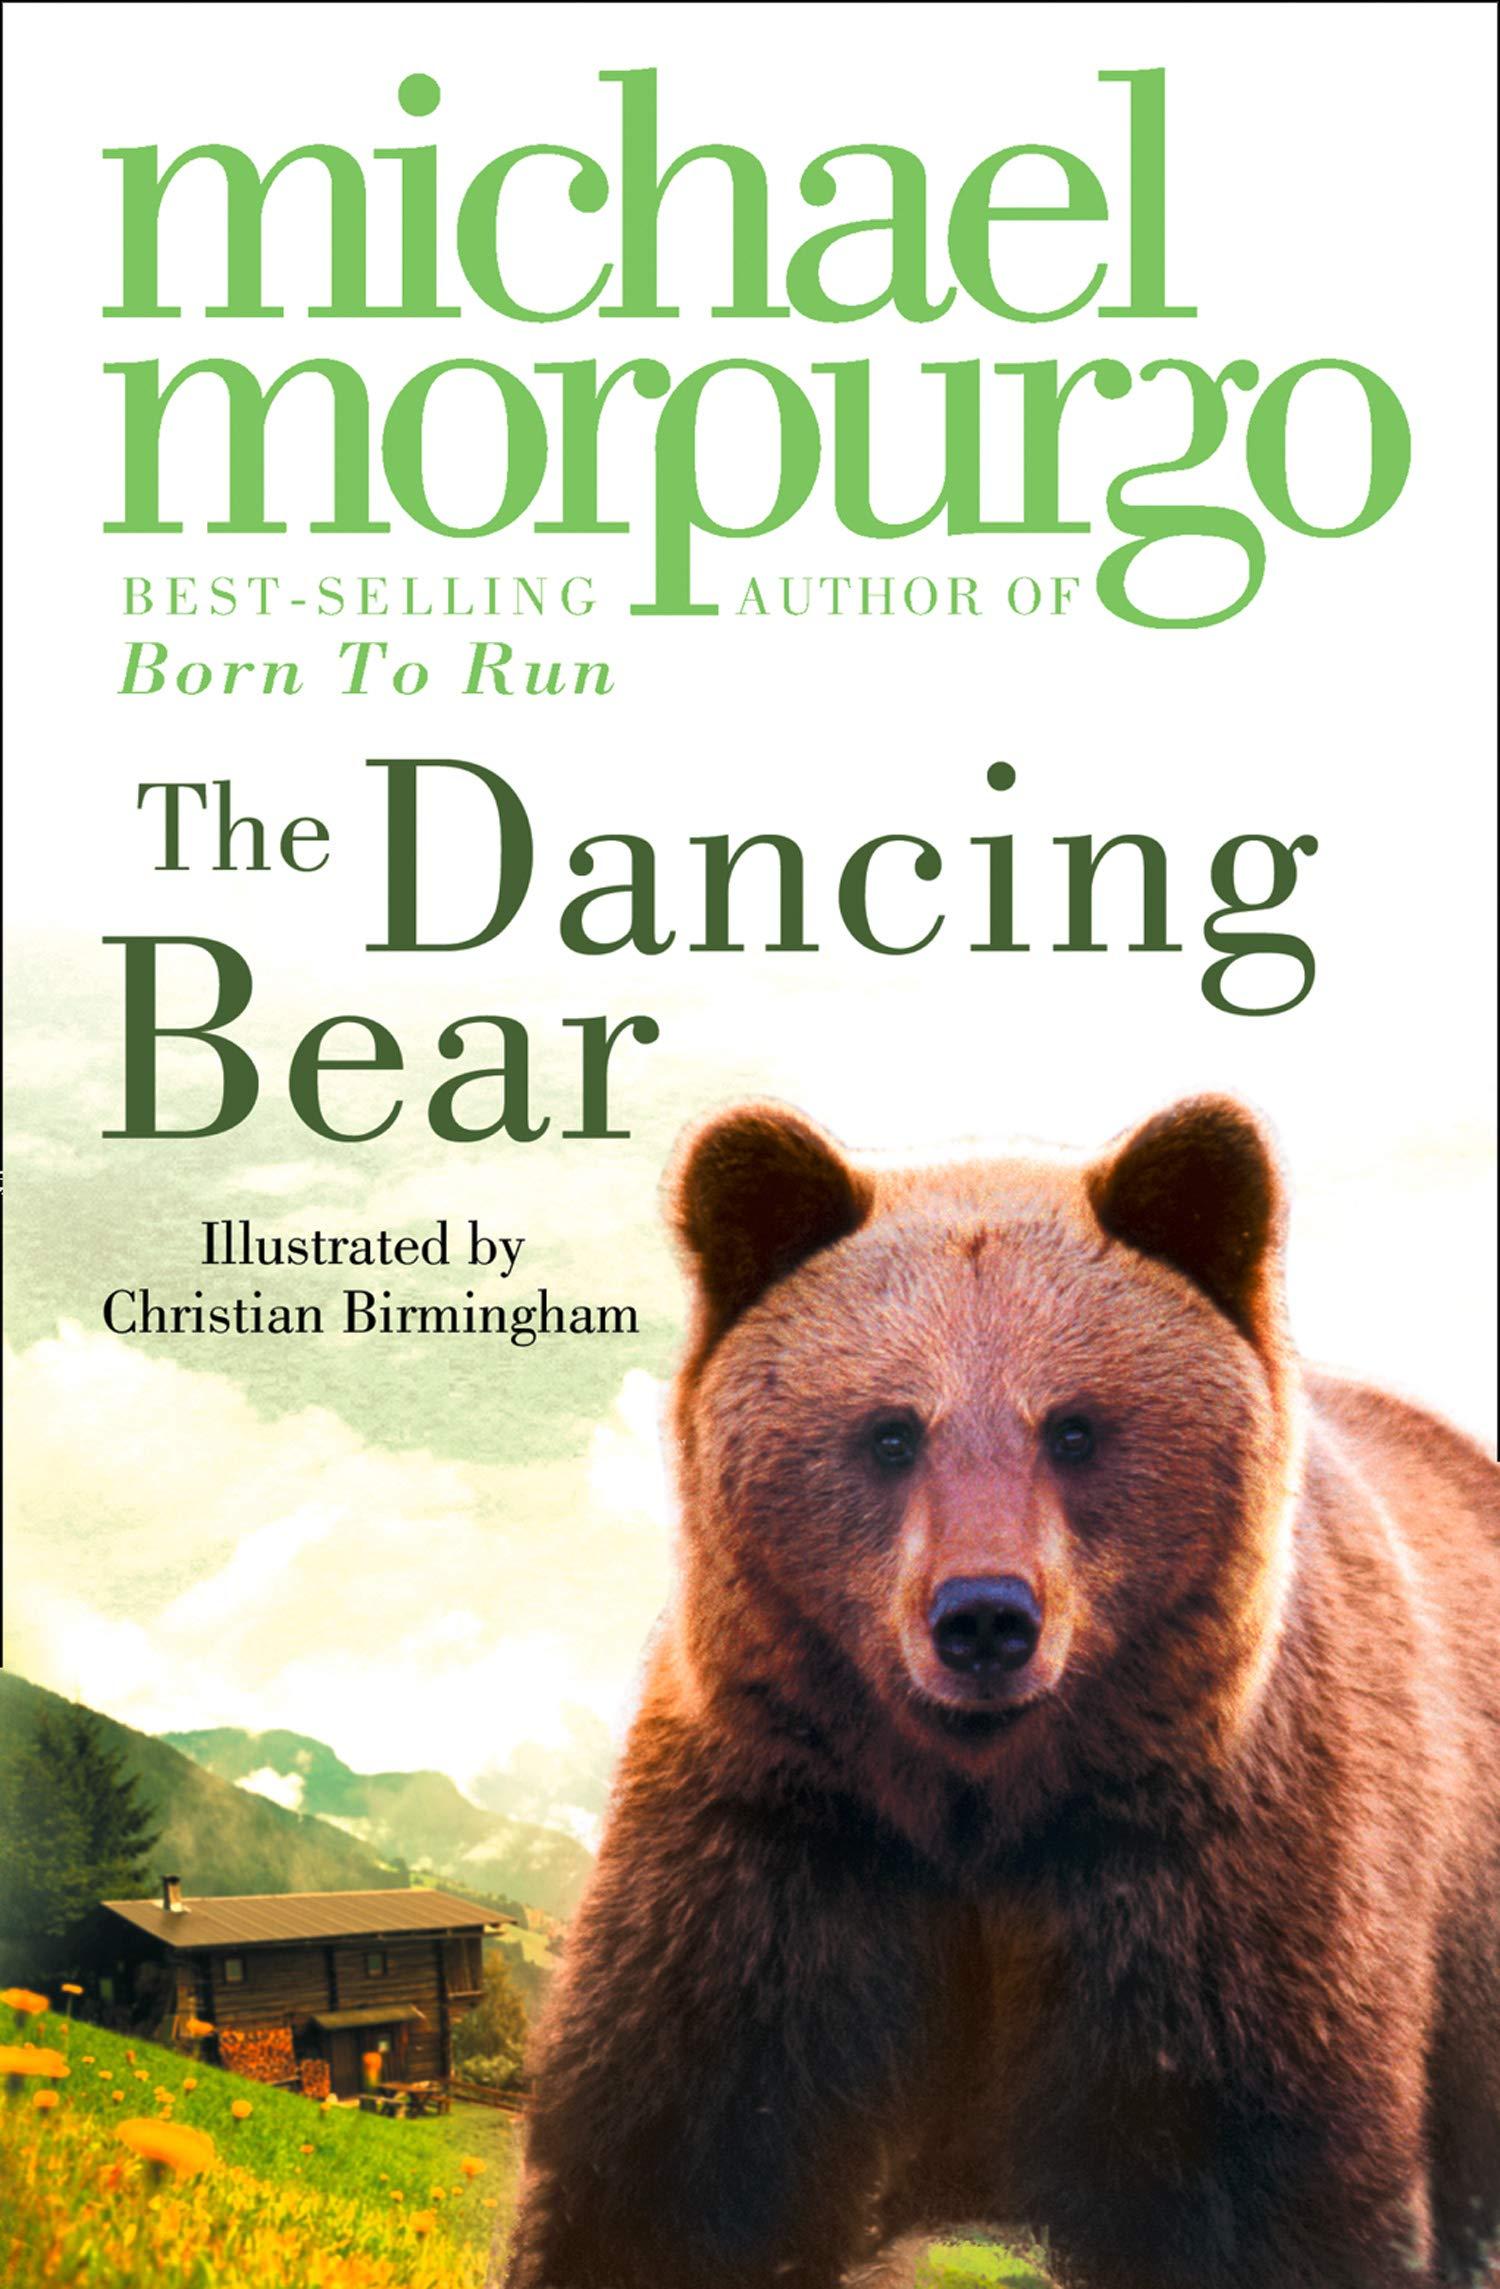 The Dancing Bear (Young Lion Storybook S) : Morpurgo, Michael:  Amazon.co.uk: Books